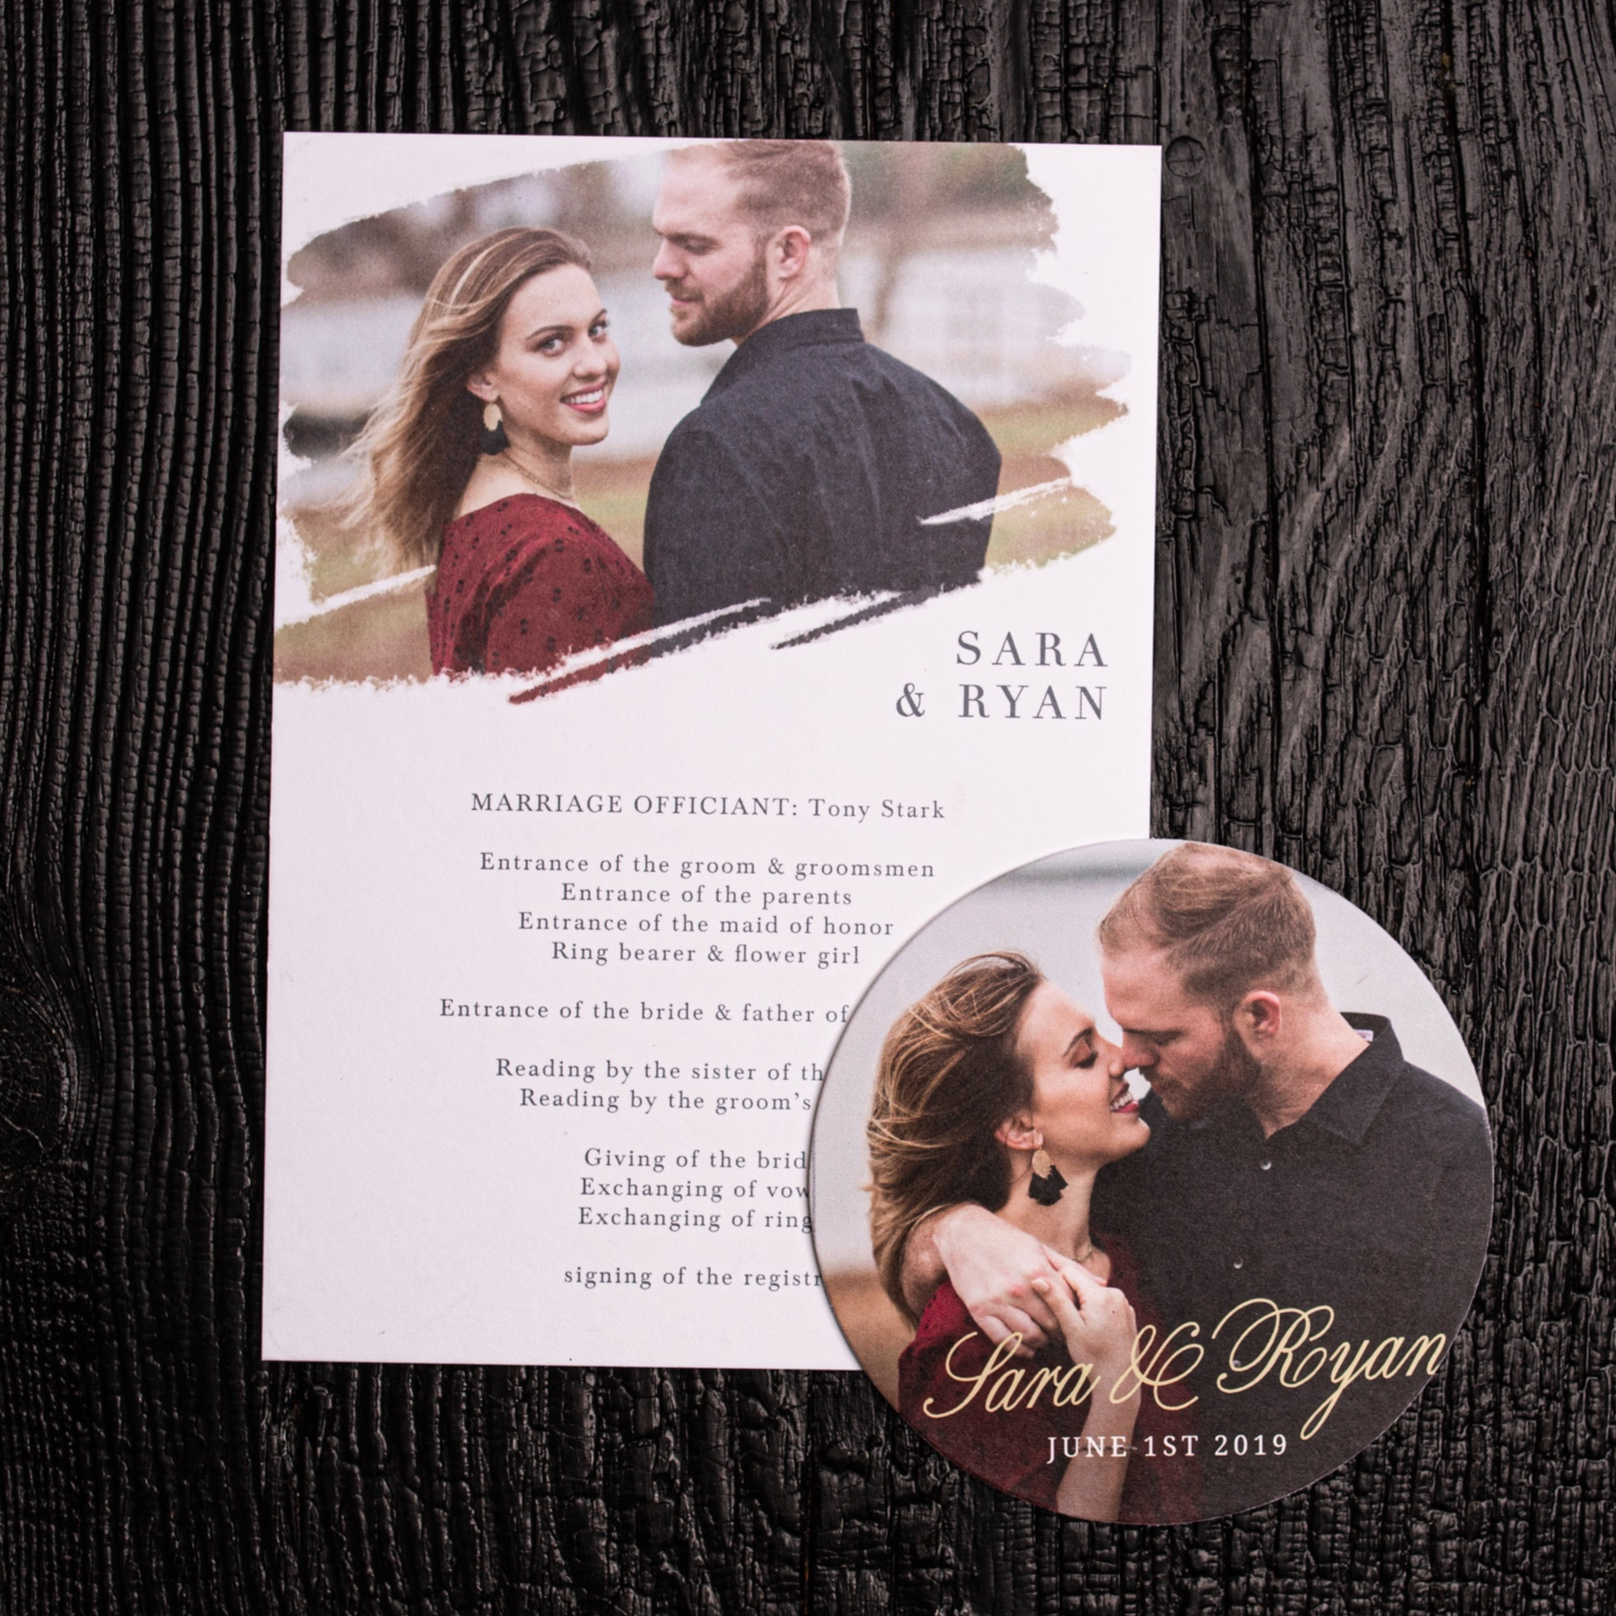 Wedding Schedule and Coaster